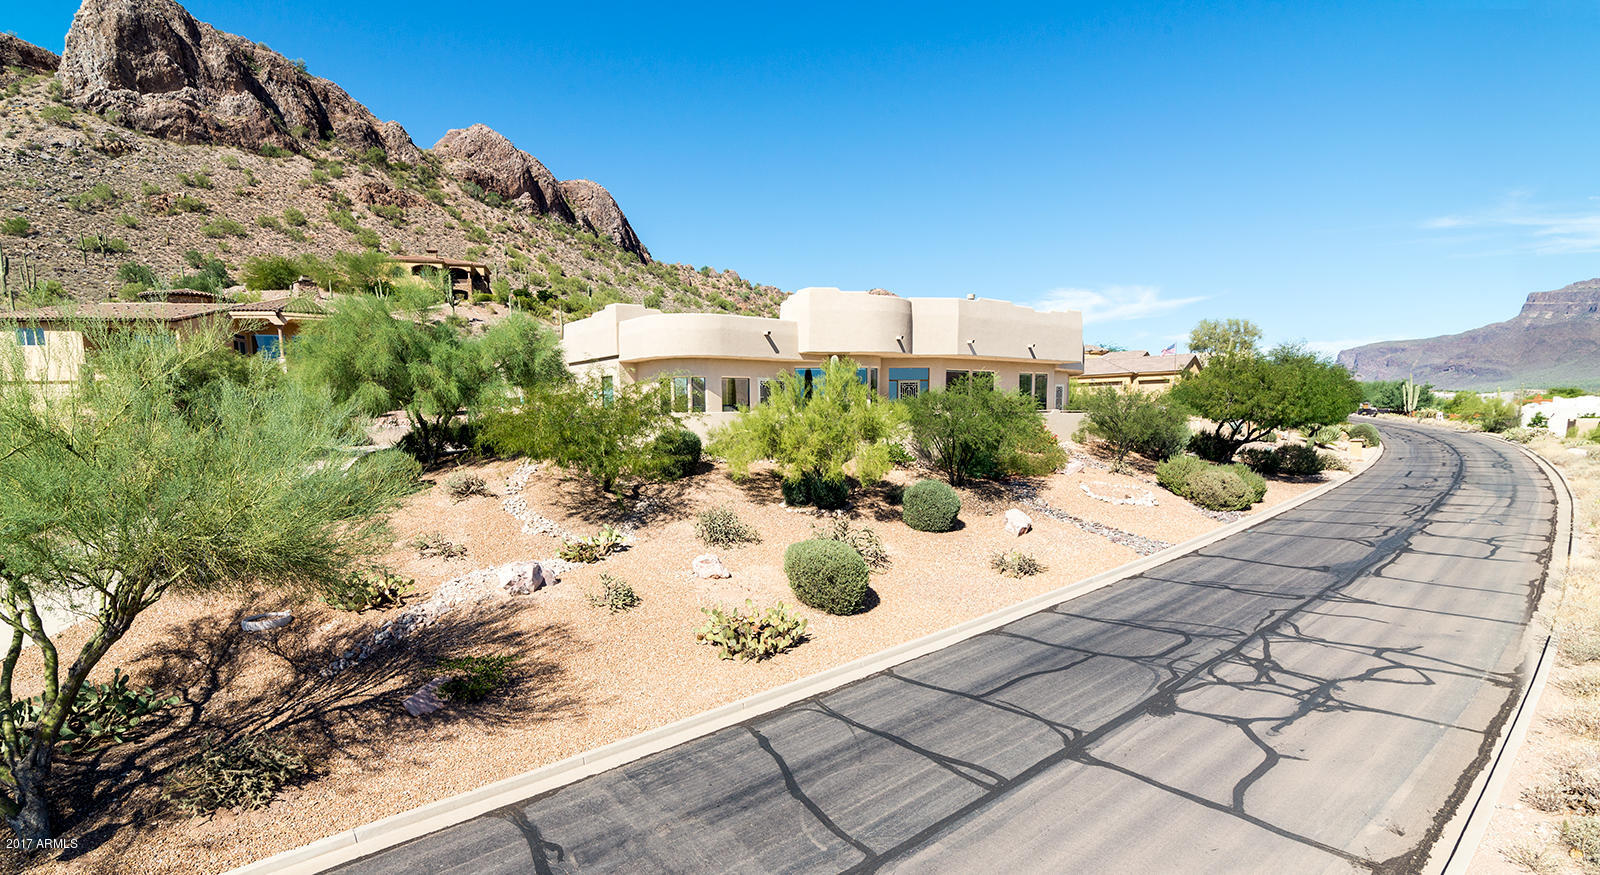 MLS 5675779 9860 E DEAD SURE Place, Gold Canyon, AZ 85118 Gold Canyon AZ Gold Canyon East